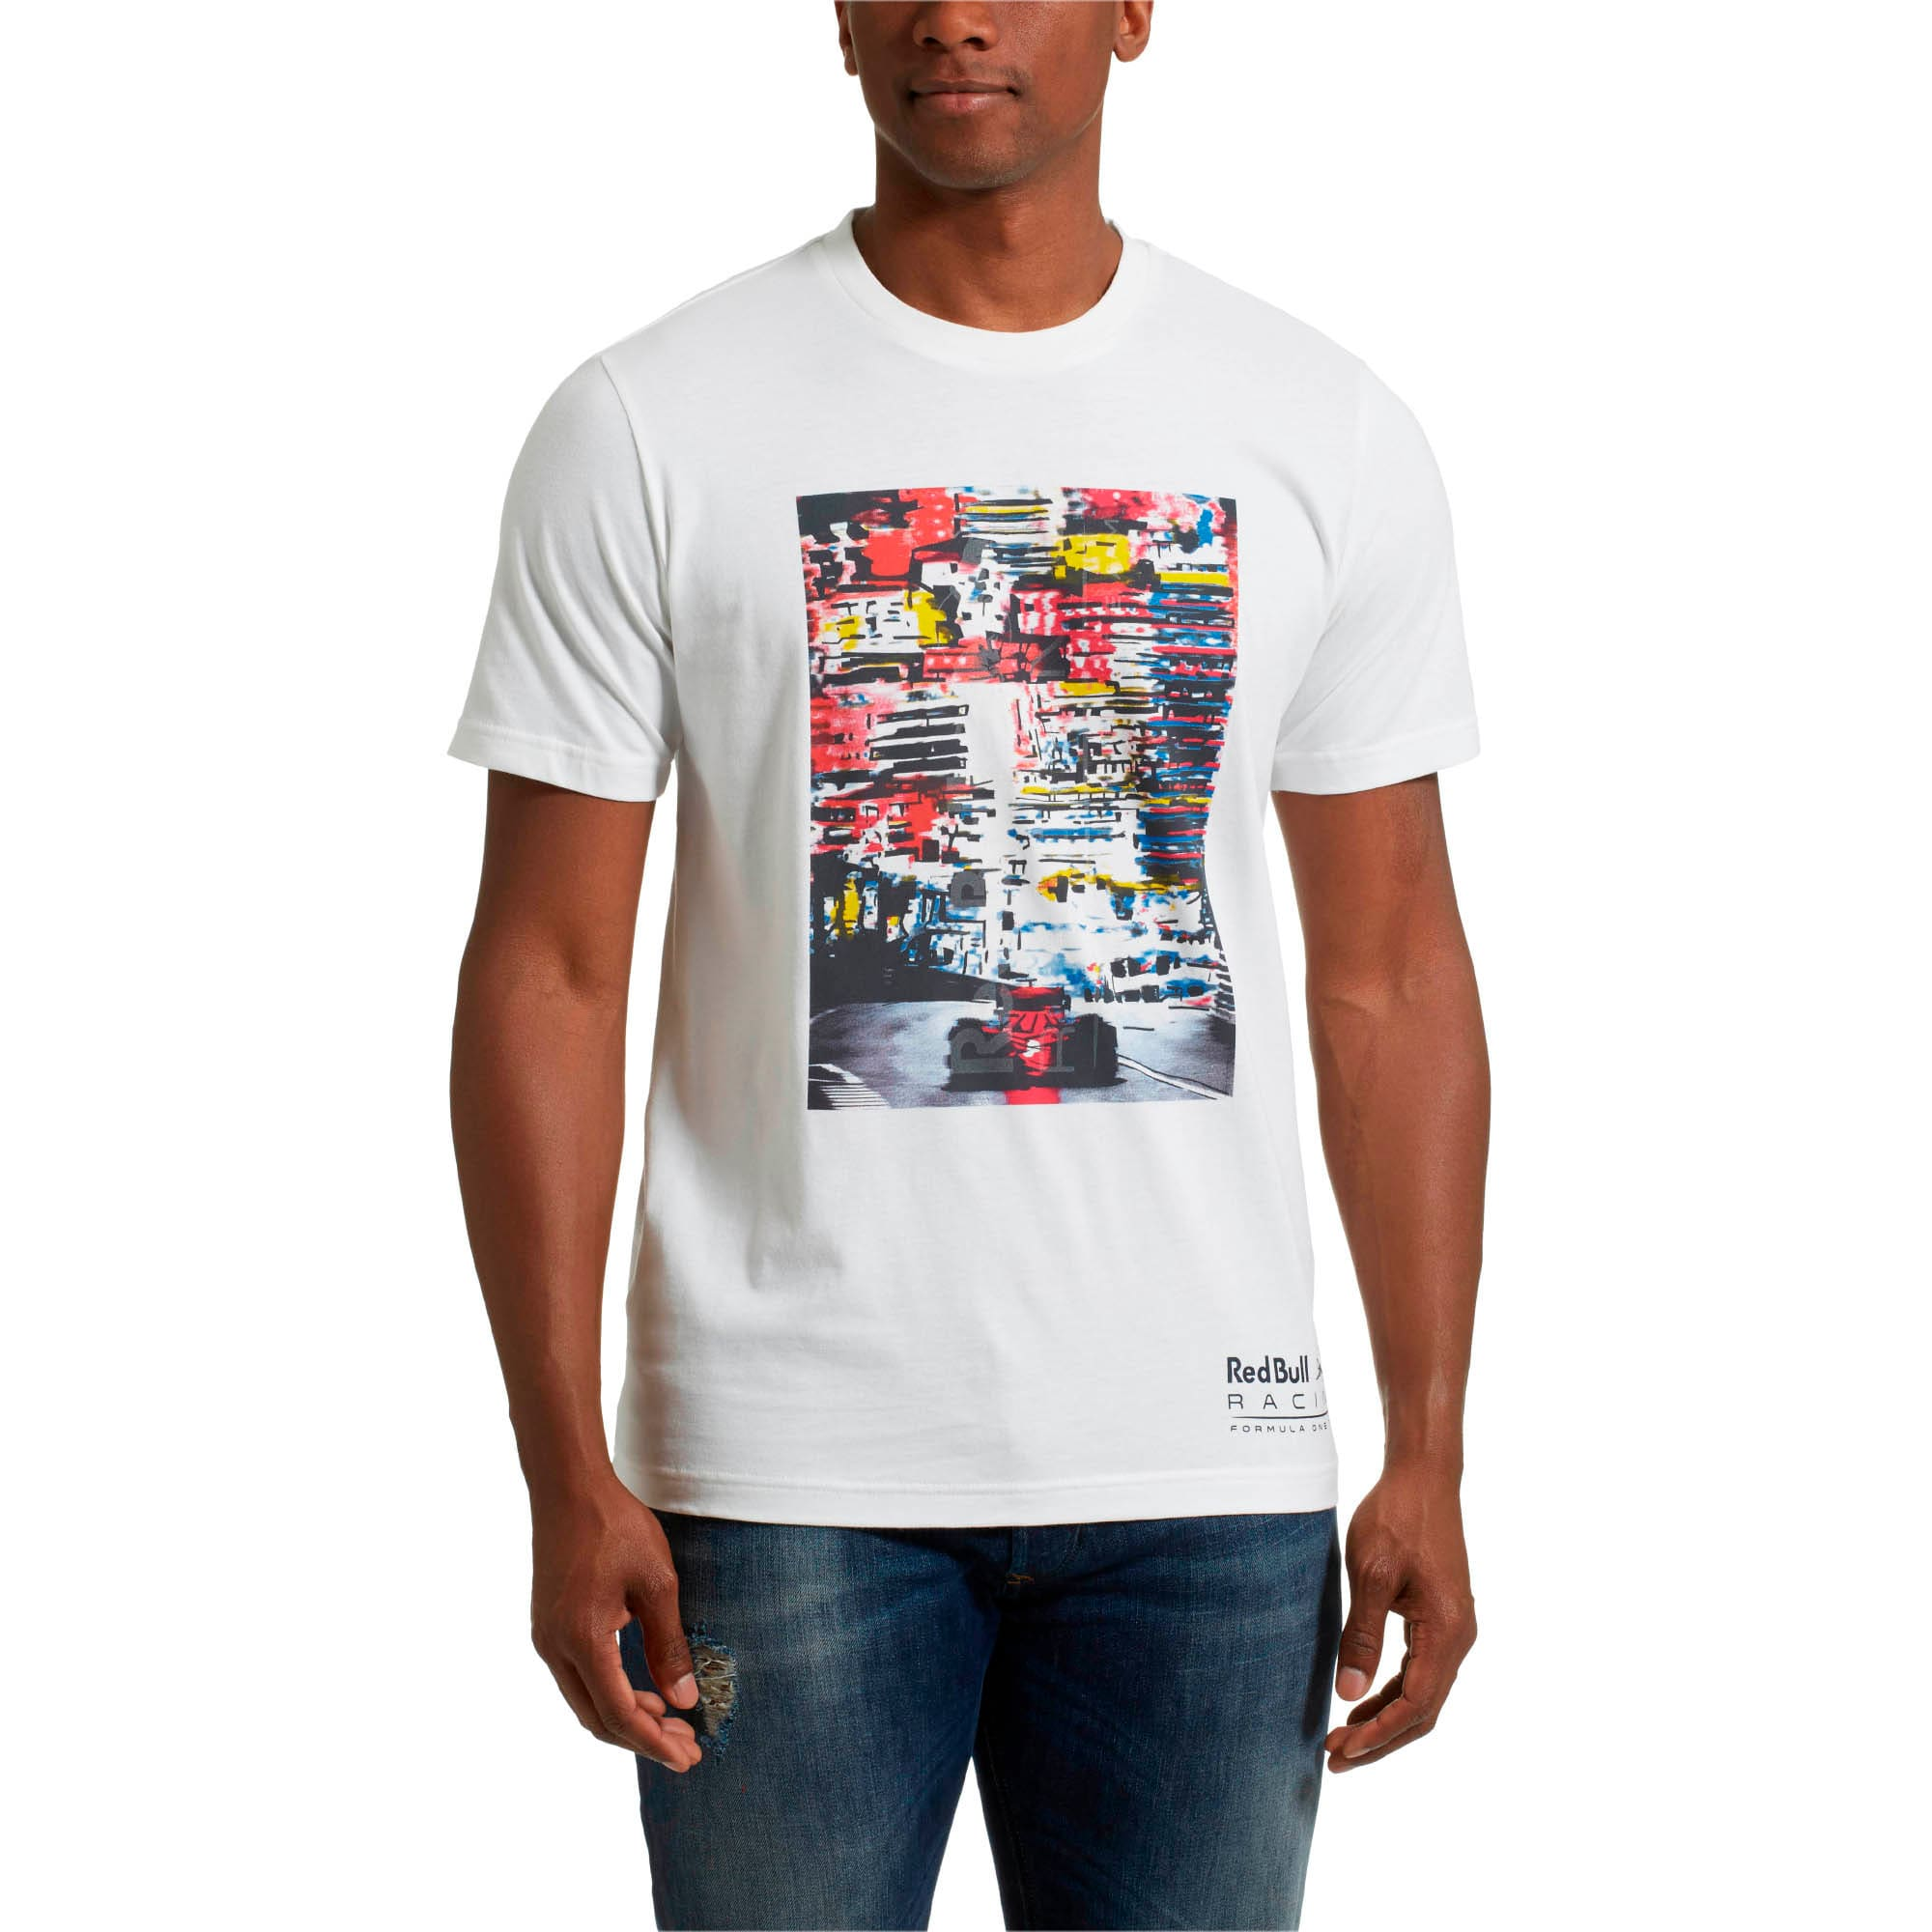 Thumbnail 2 of Red Bull Racing Lifestyle Men's Graphic T-Shirt, Puma White, medium